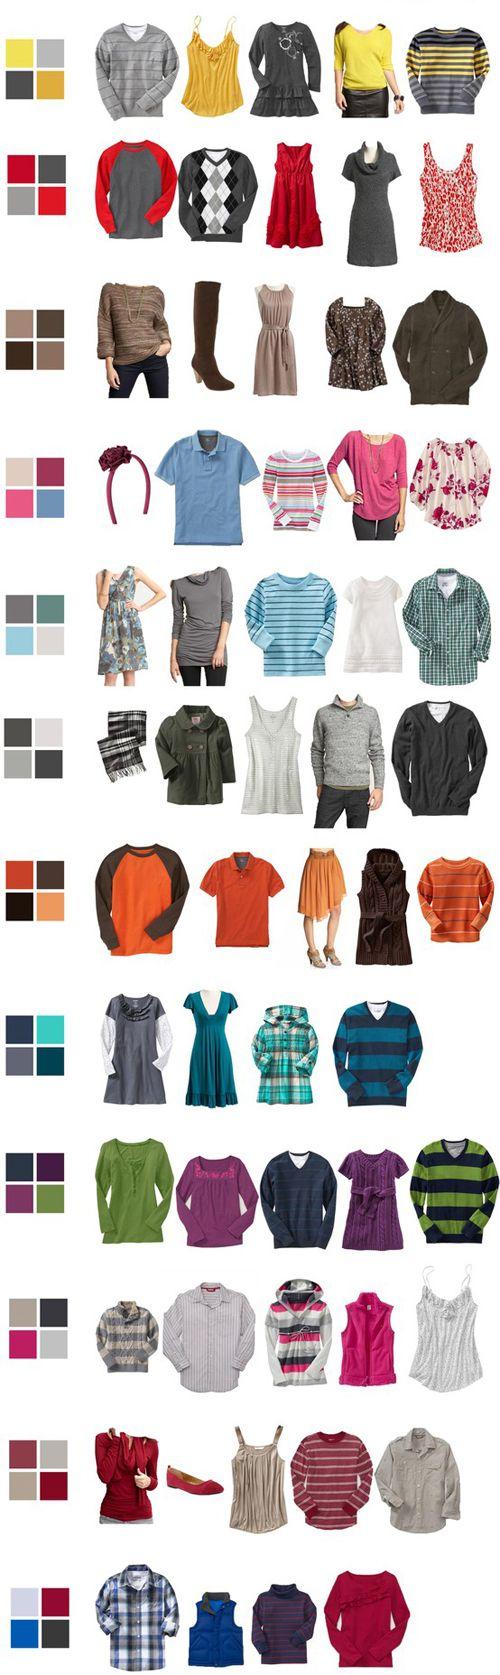 engagement-session-wardrobe-color-options.JPG